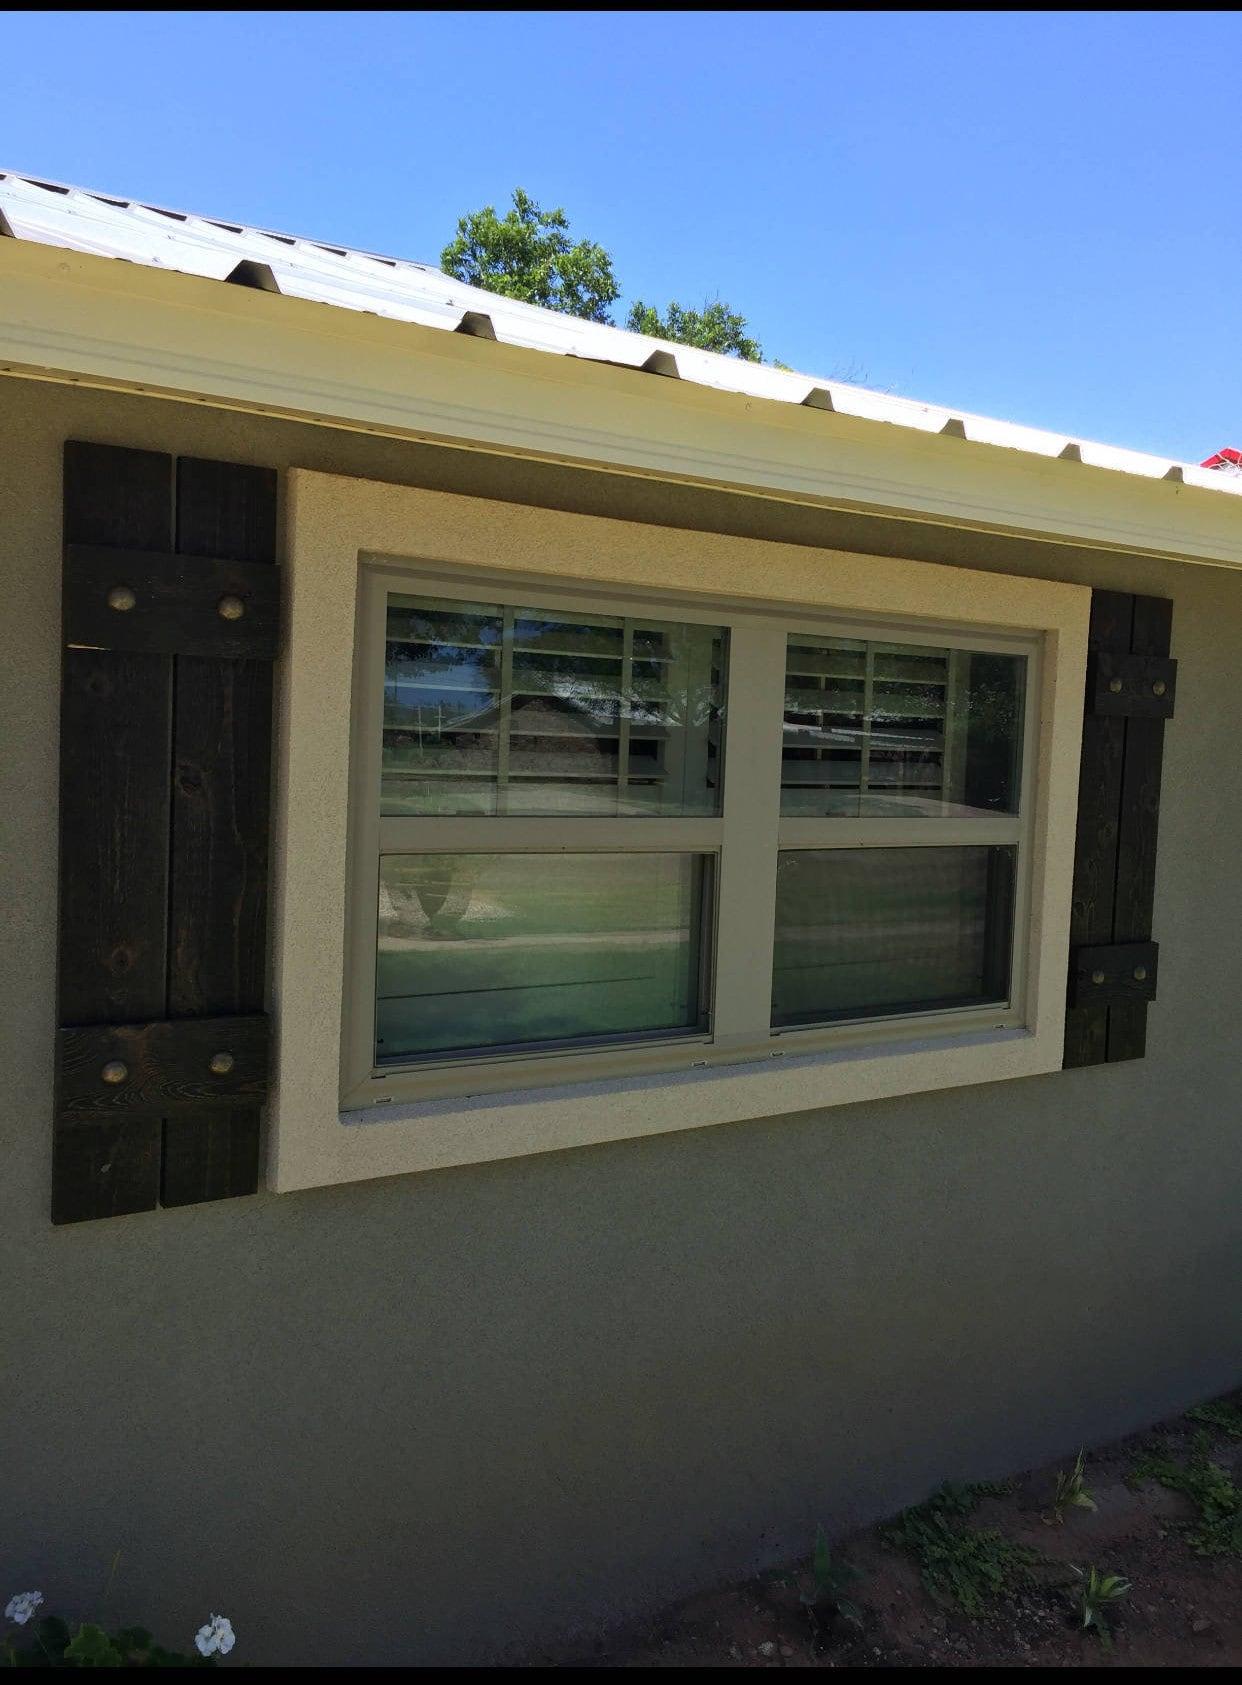 Stained cedar shutters exterior shutters Board and Batten